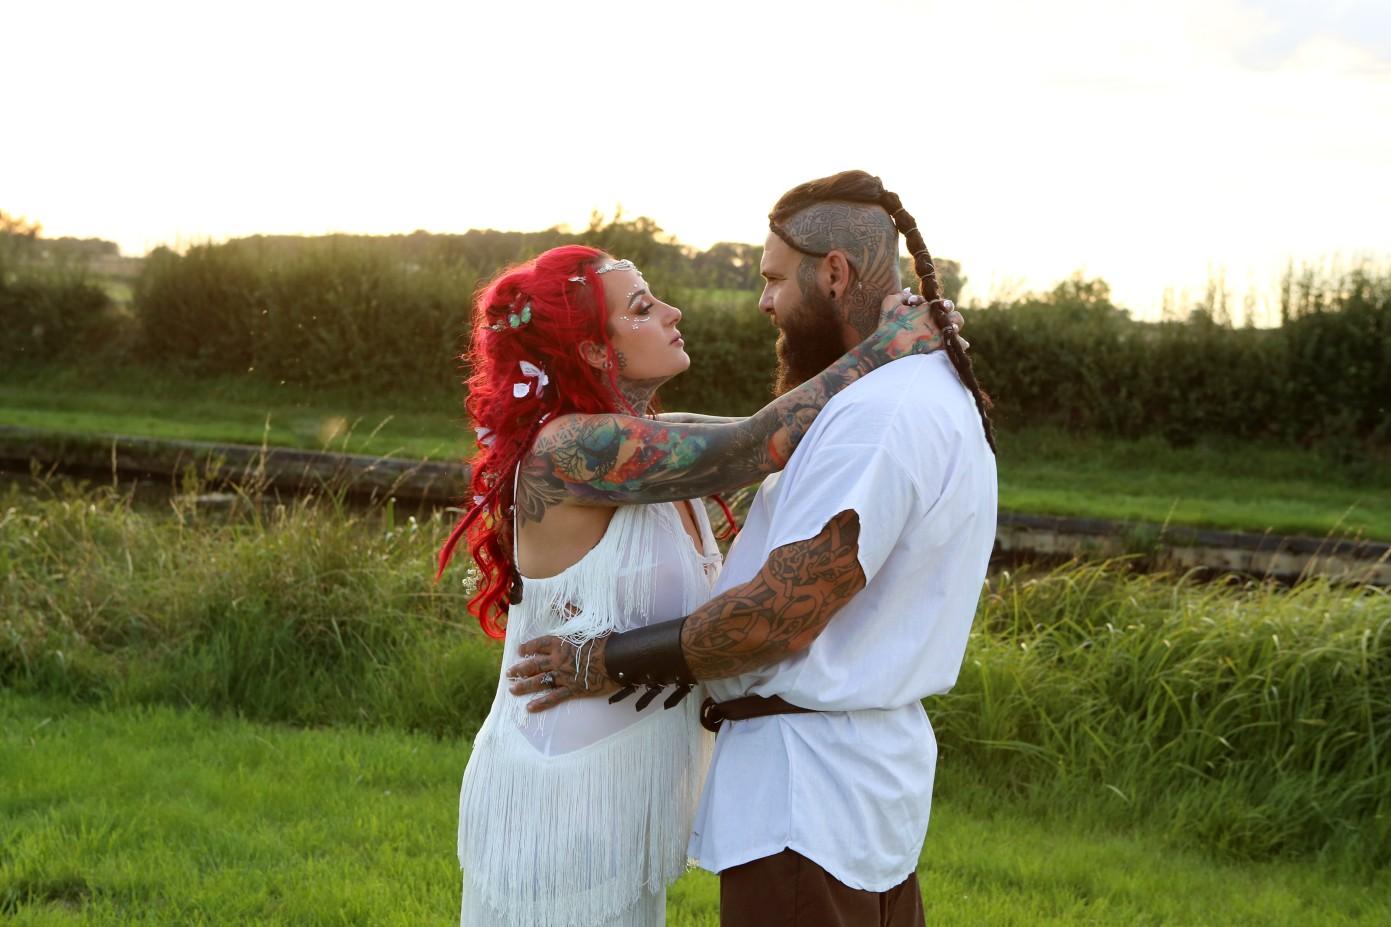 festival viking wedding - alternative couple wedding photos